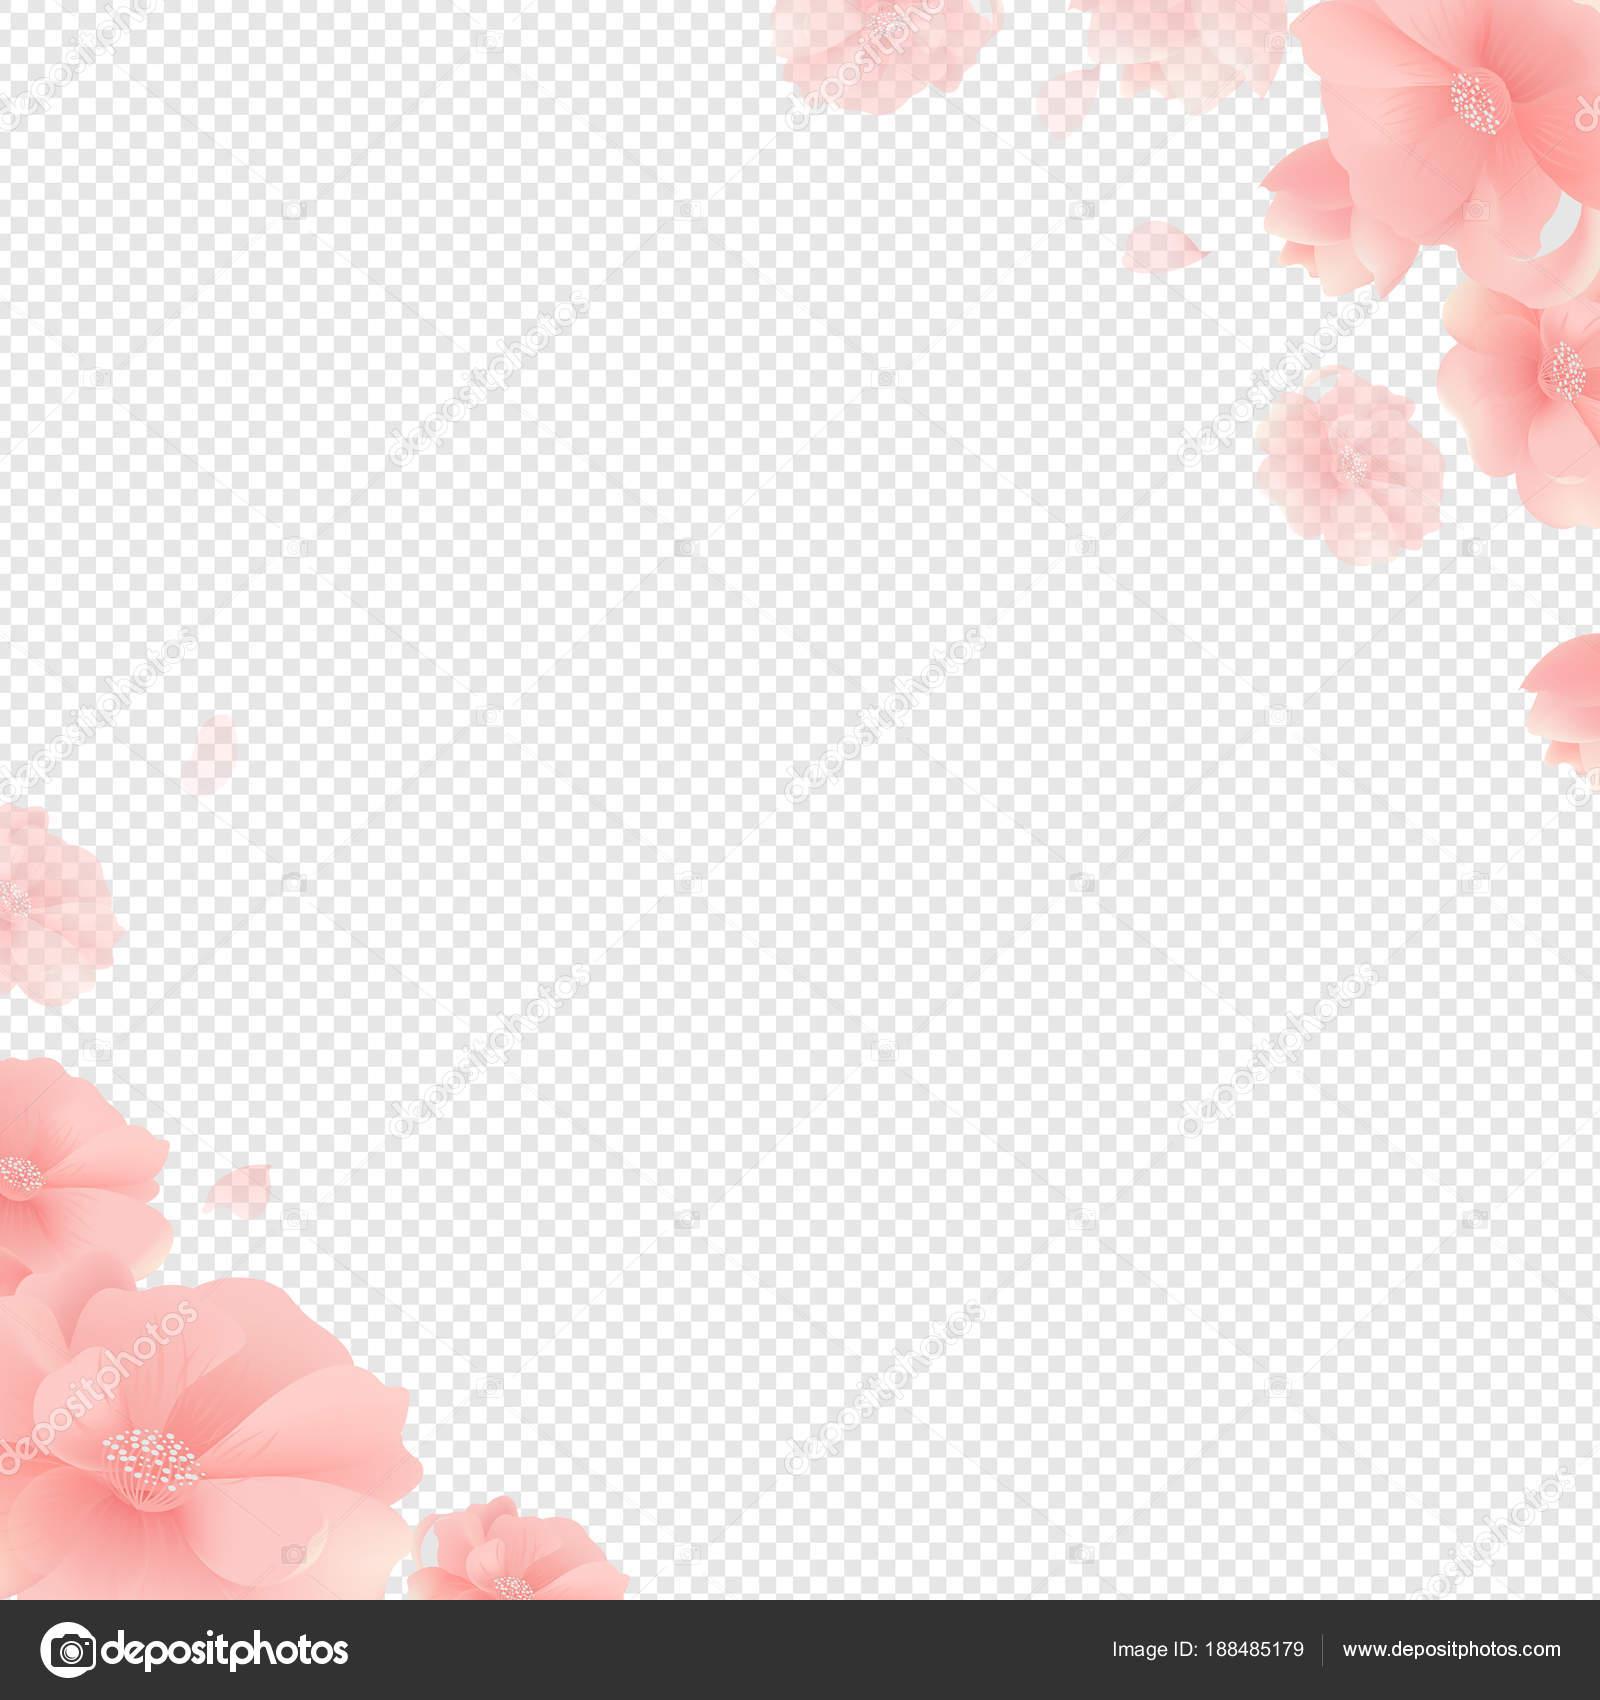 Border Flowers Transparent Background Gradient Mesh Vector Illustration Stock